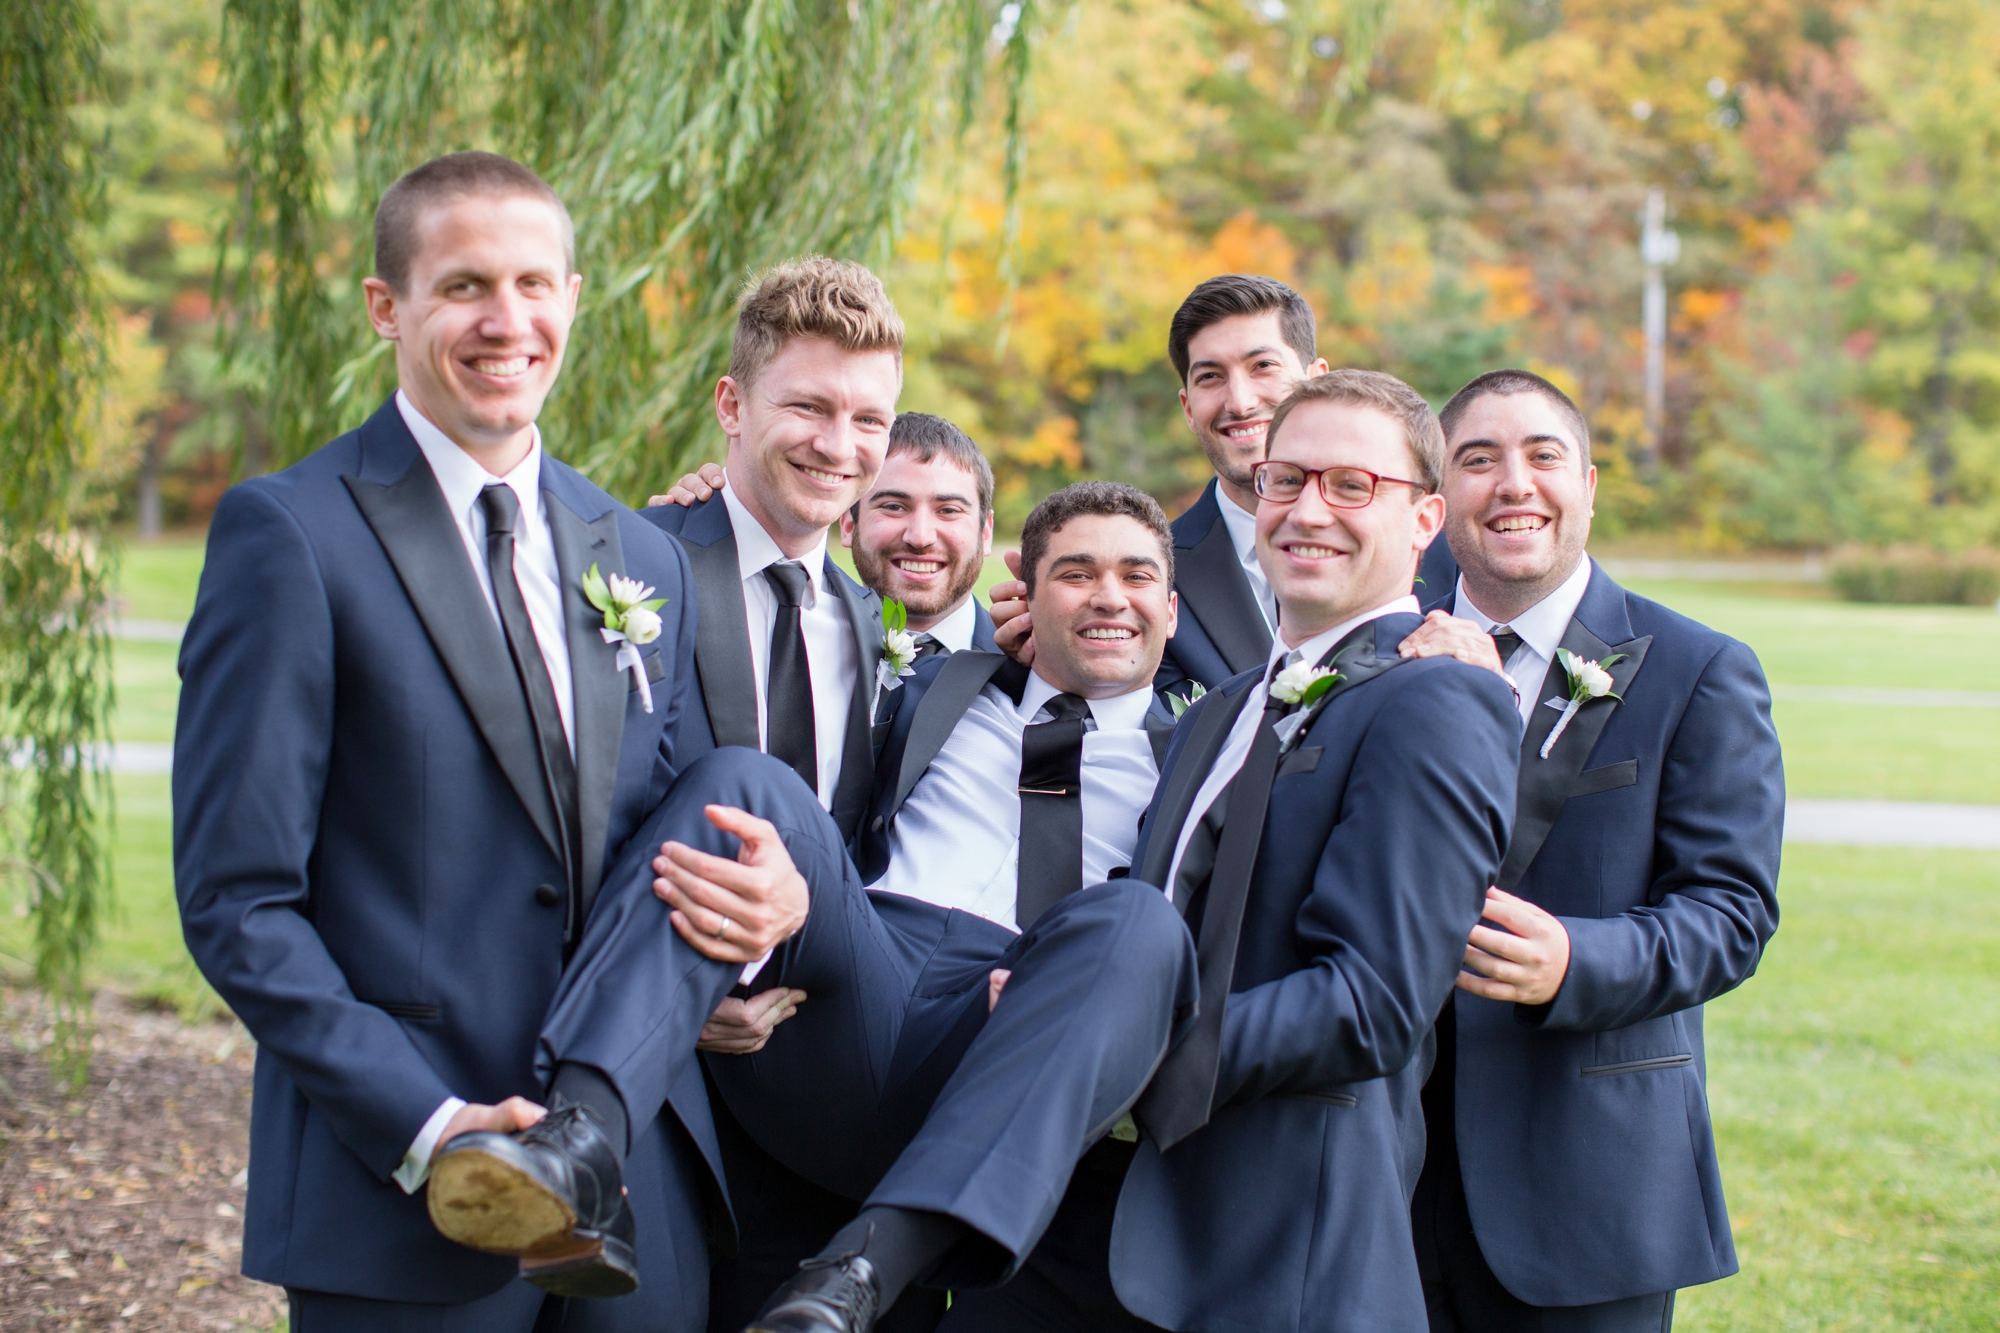 3-Finkel Wedding Bridal Party-409_anna grace photography maryland wedding photographer turf valley.jpg